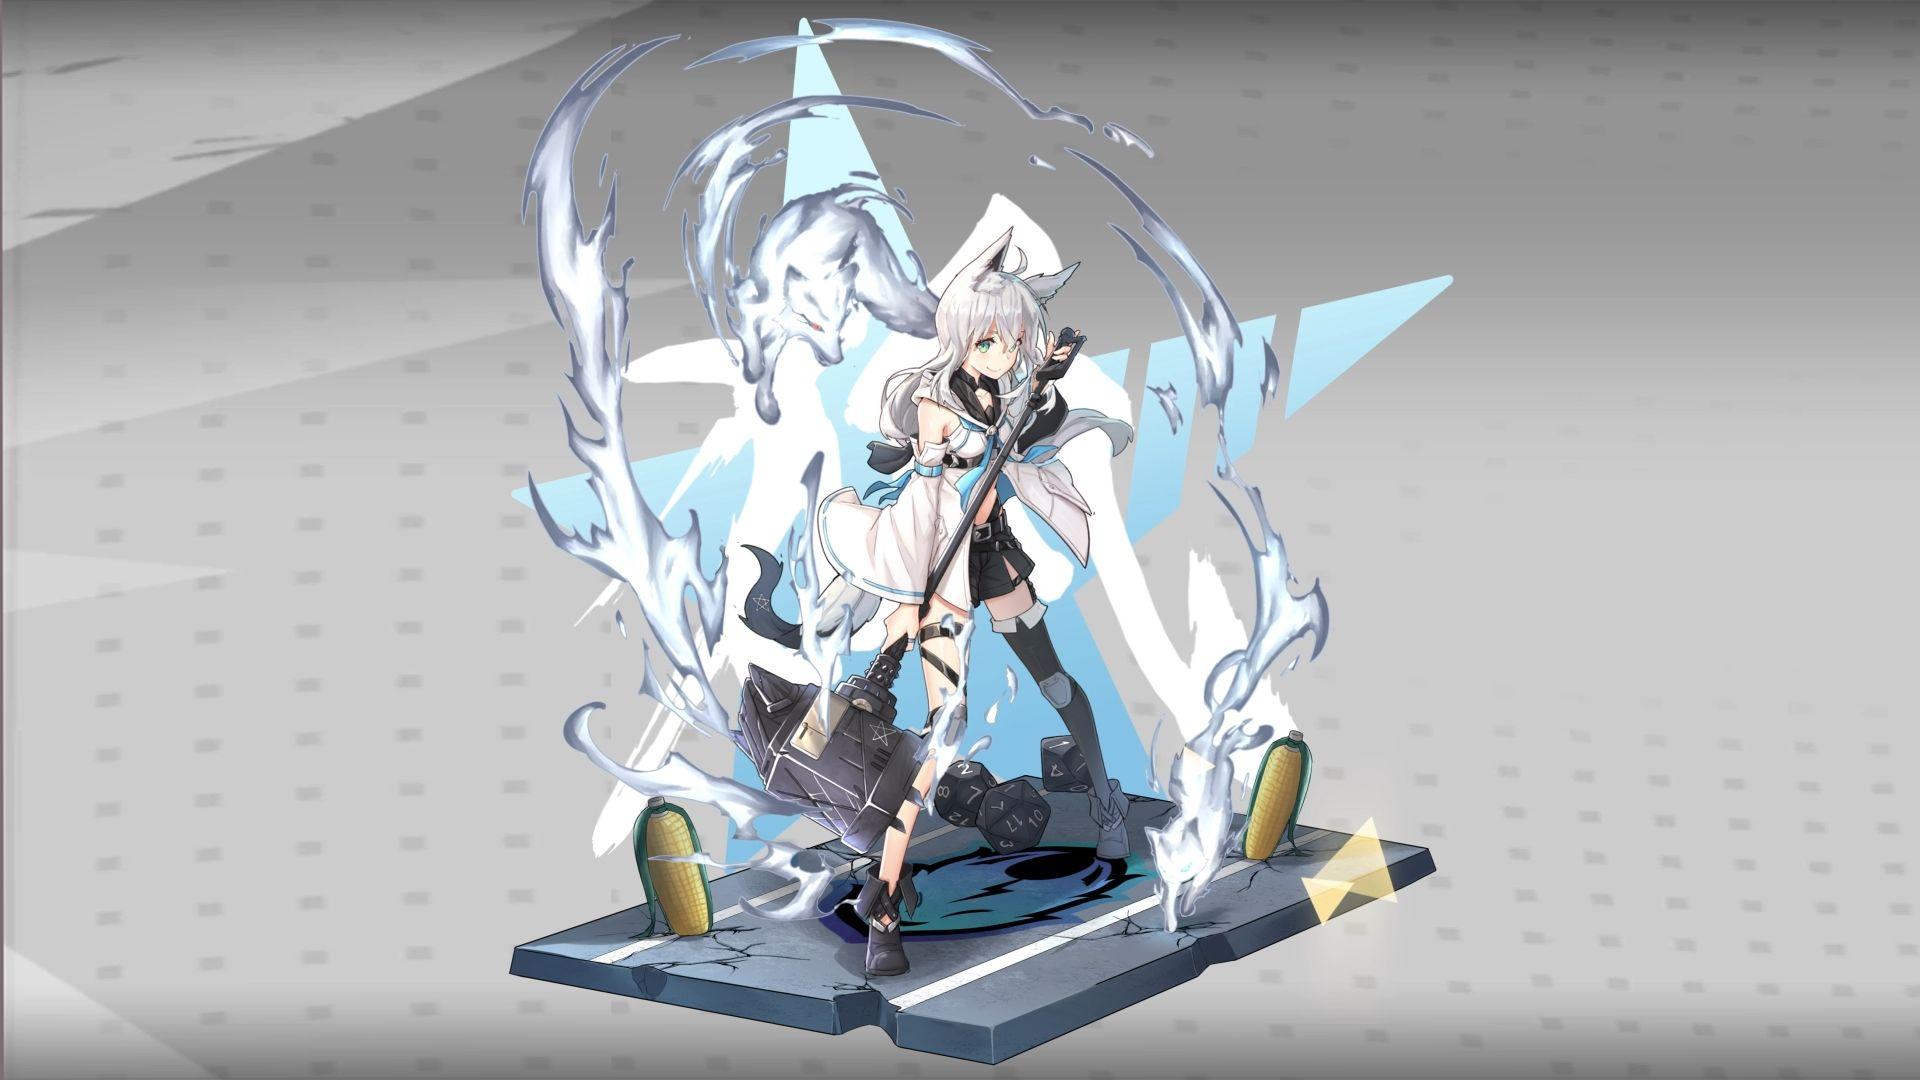 Vtuber Shirakami Fubuki Hololive X Arknights 1080p Wallpaper Engine Anime Wallpaper Size 1080p Wallpaper Wallpaper